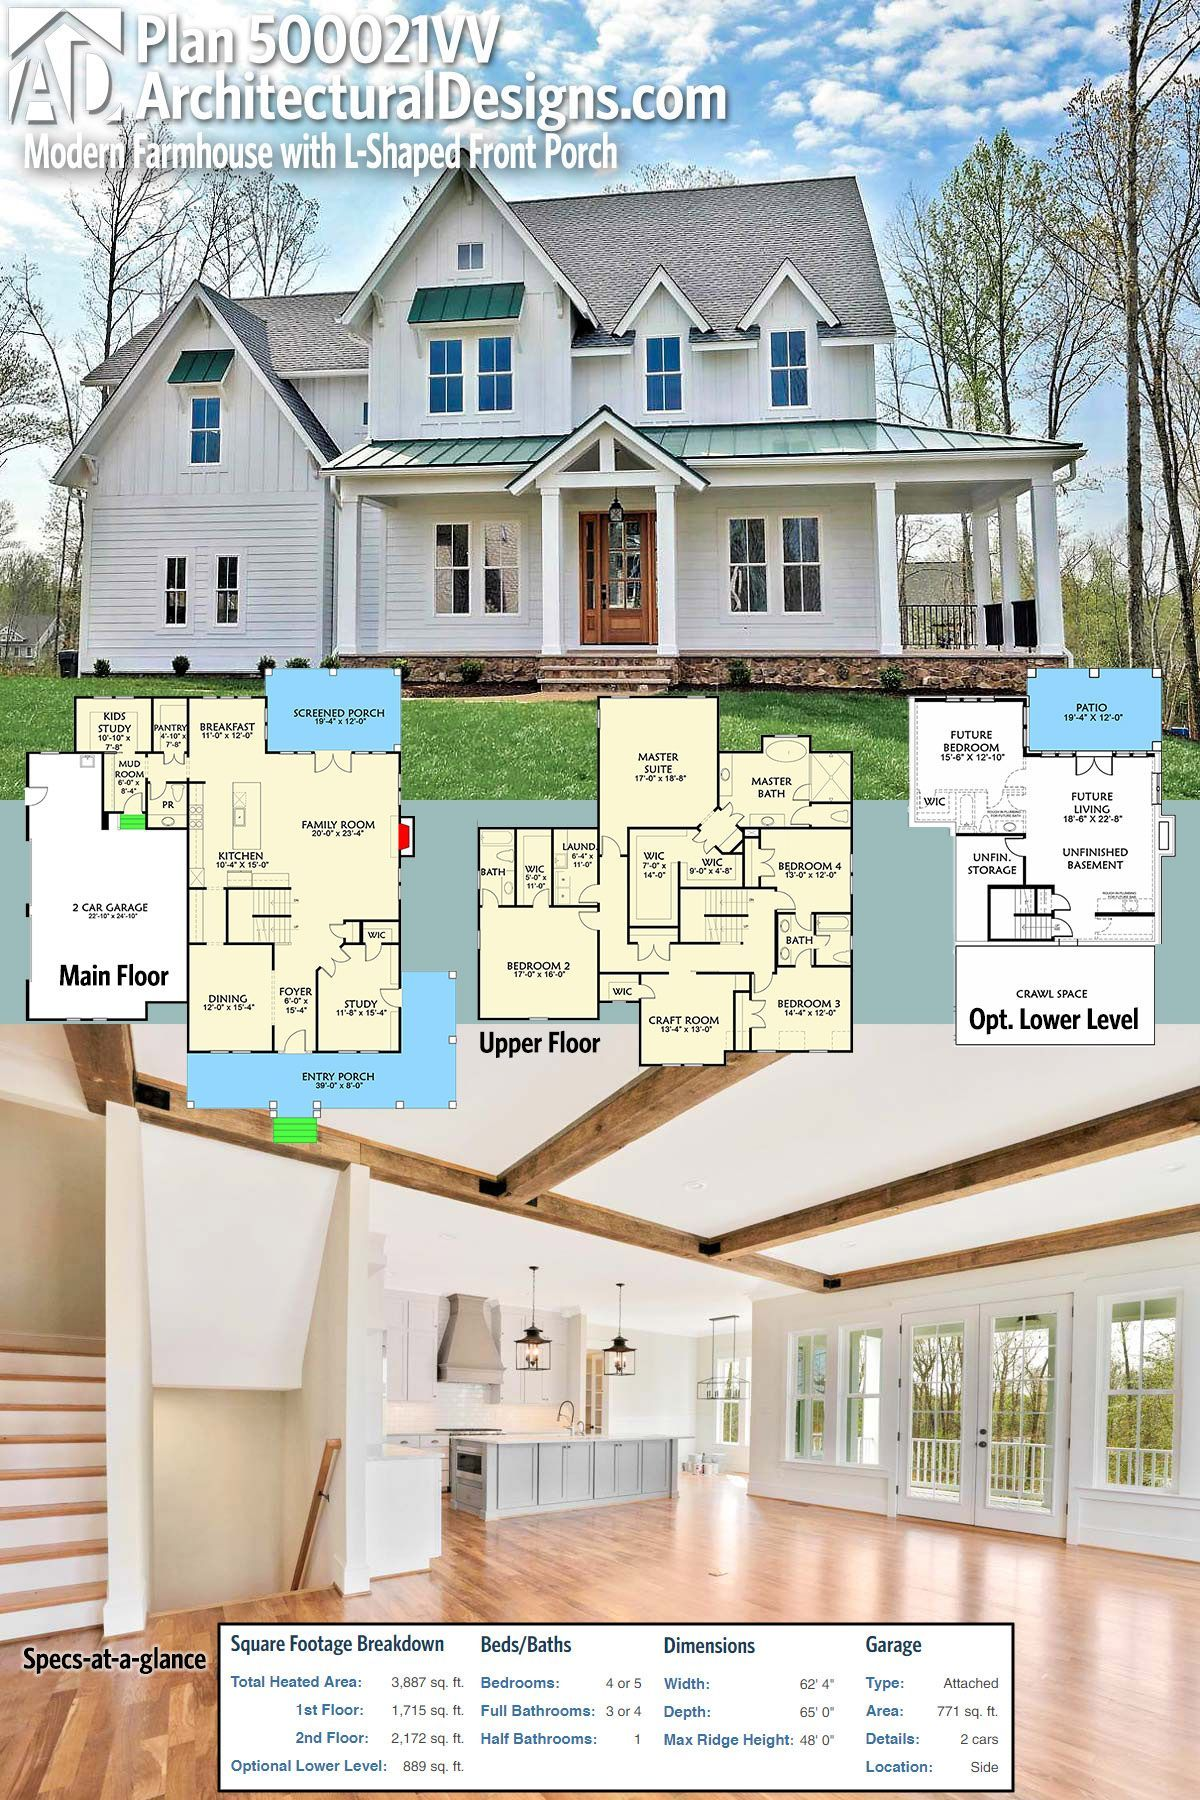 Introducing Architectural Designs Modern Farmhouse Plan 500021VV